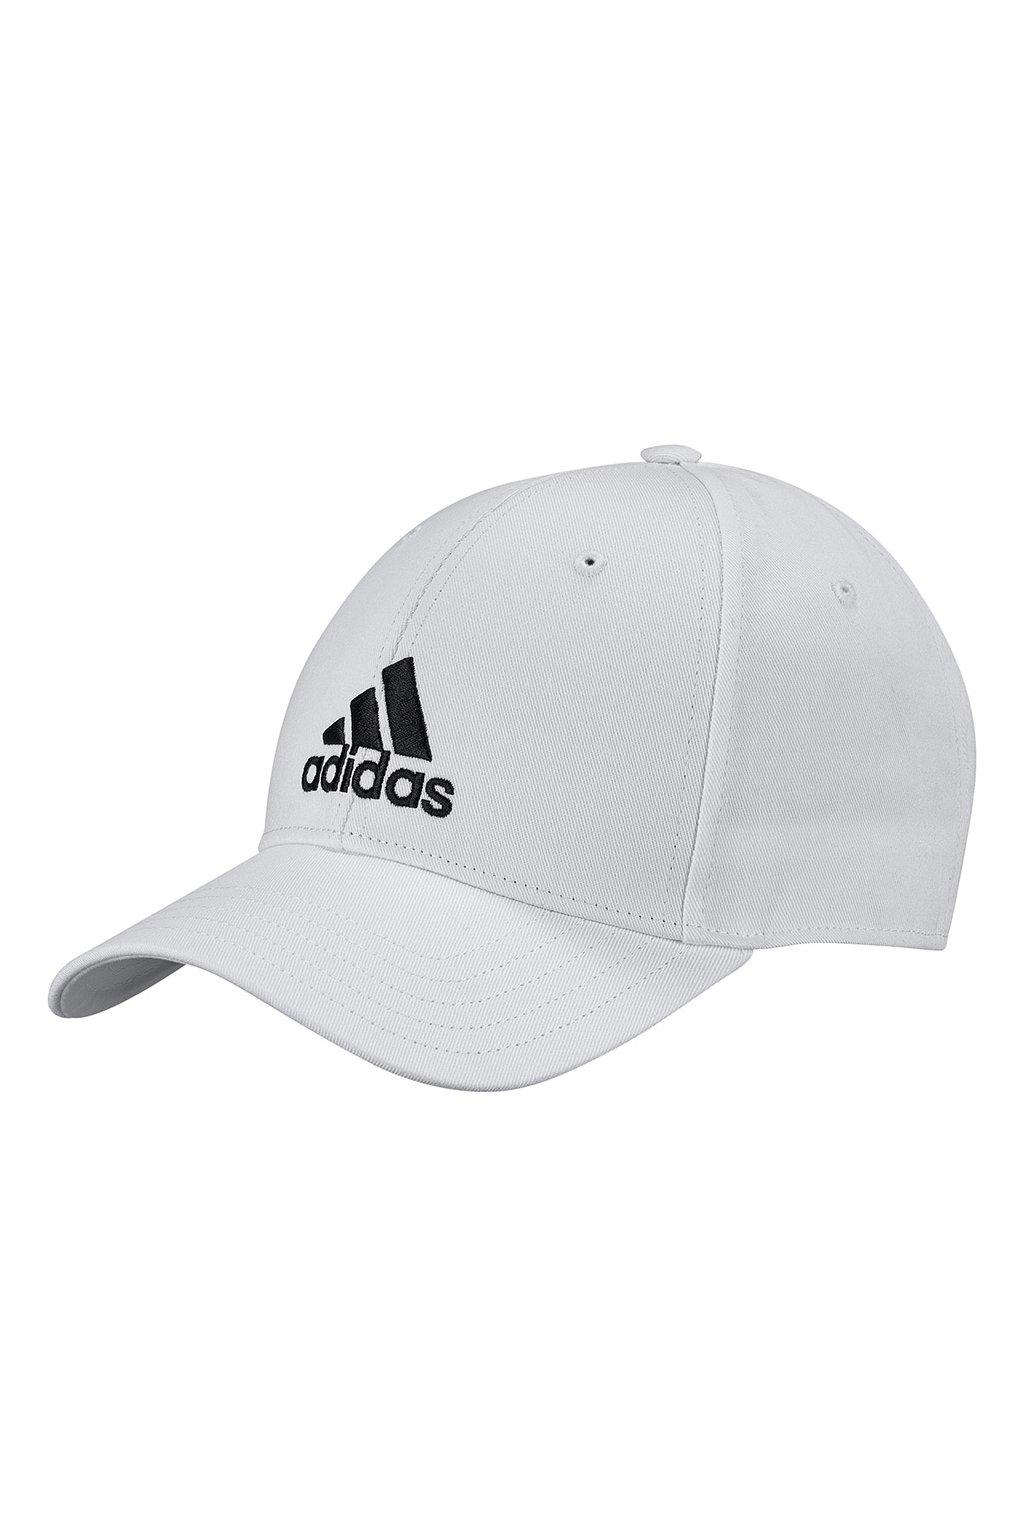 Dámska šiltovka Adidas Baseball Cap Cotton OSFW biela FK0890